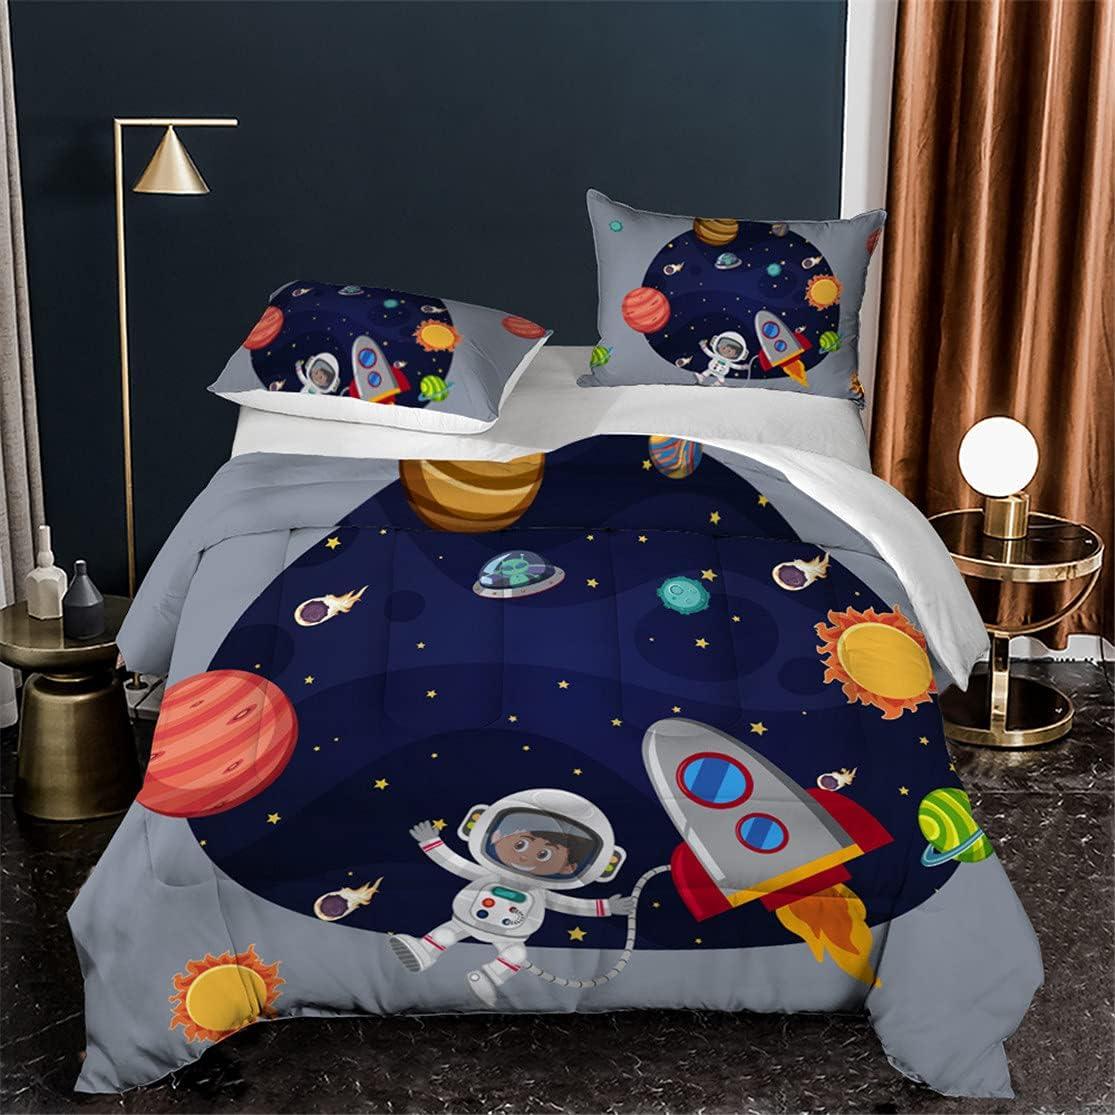 HMT NF Space Astronaut Comforter Planet Ship trend rank Set OFFer Printing Rocket